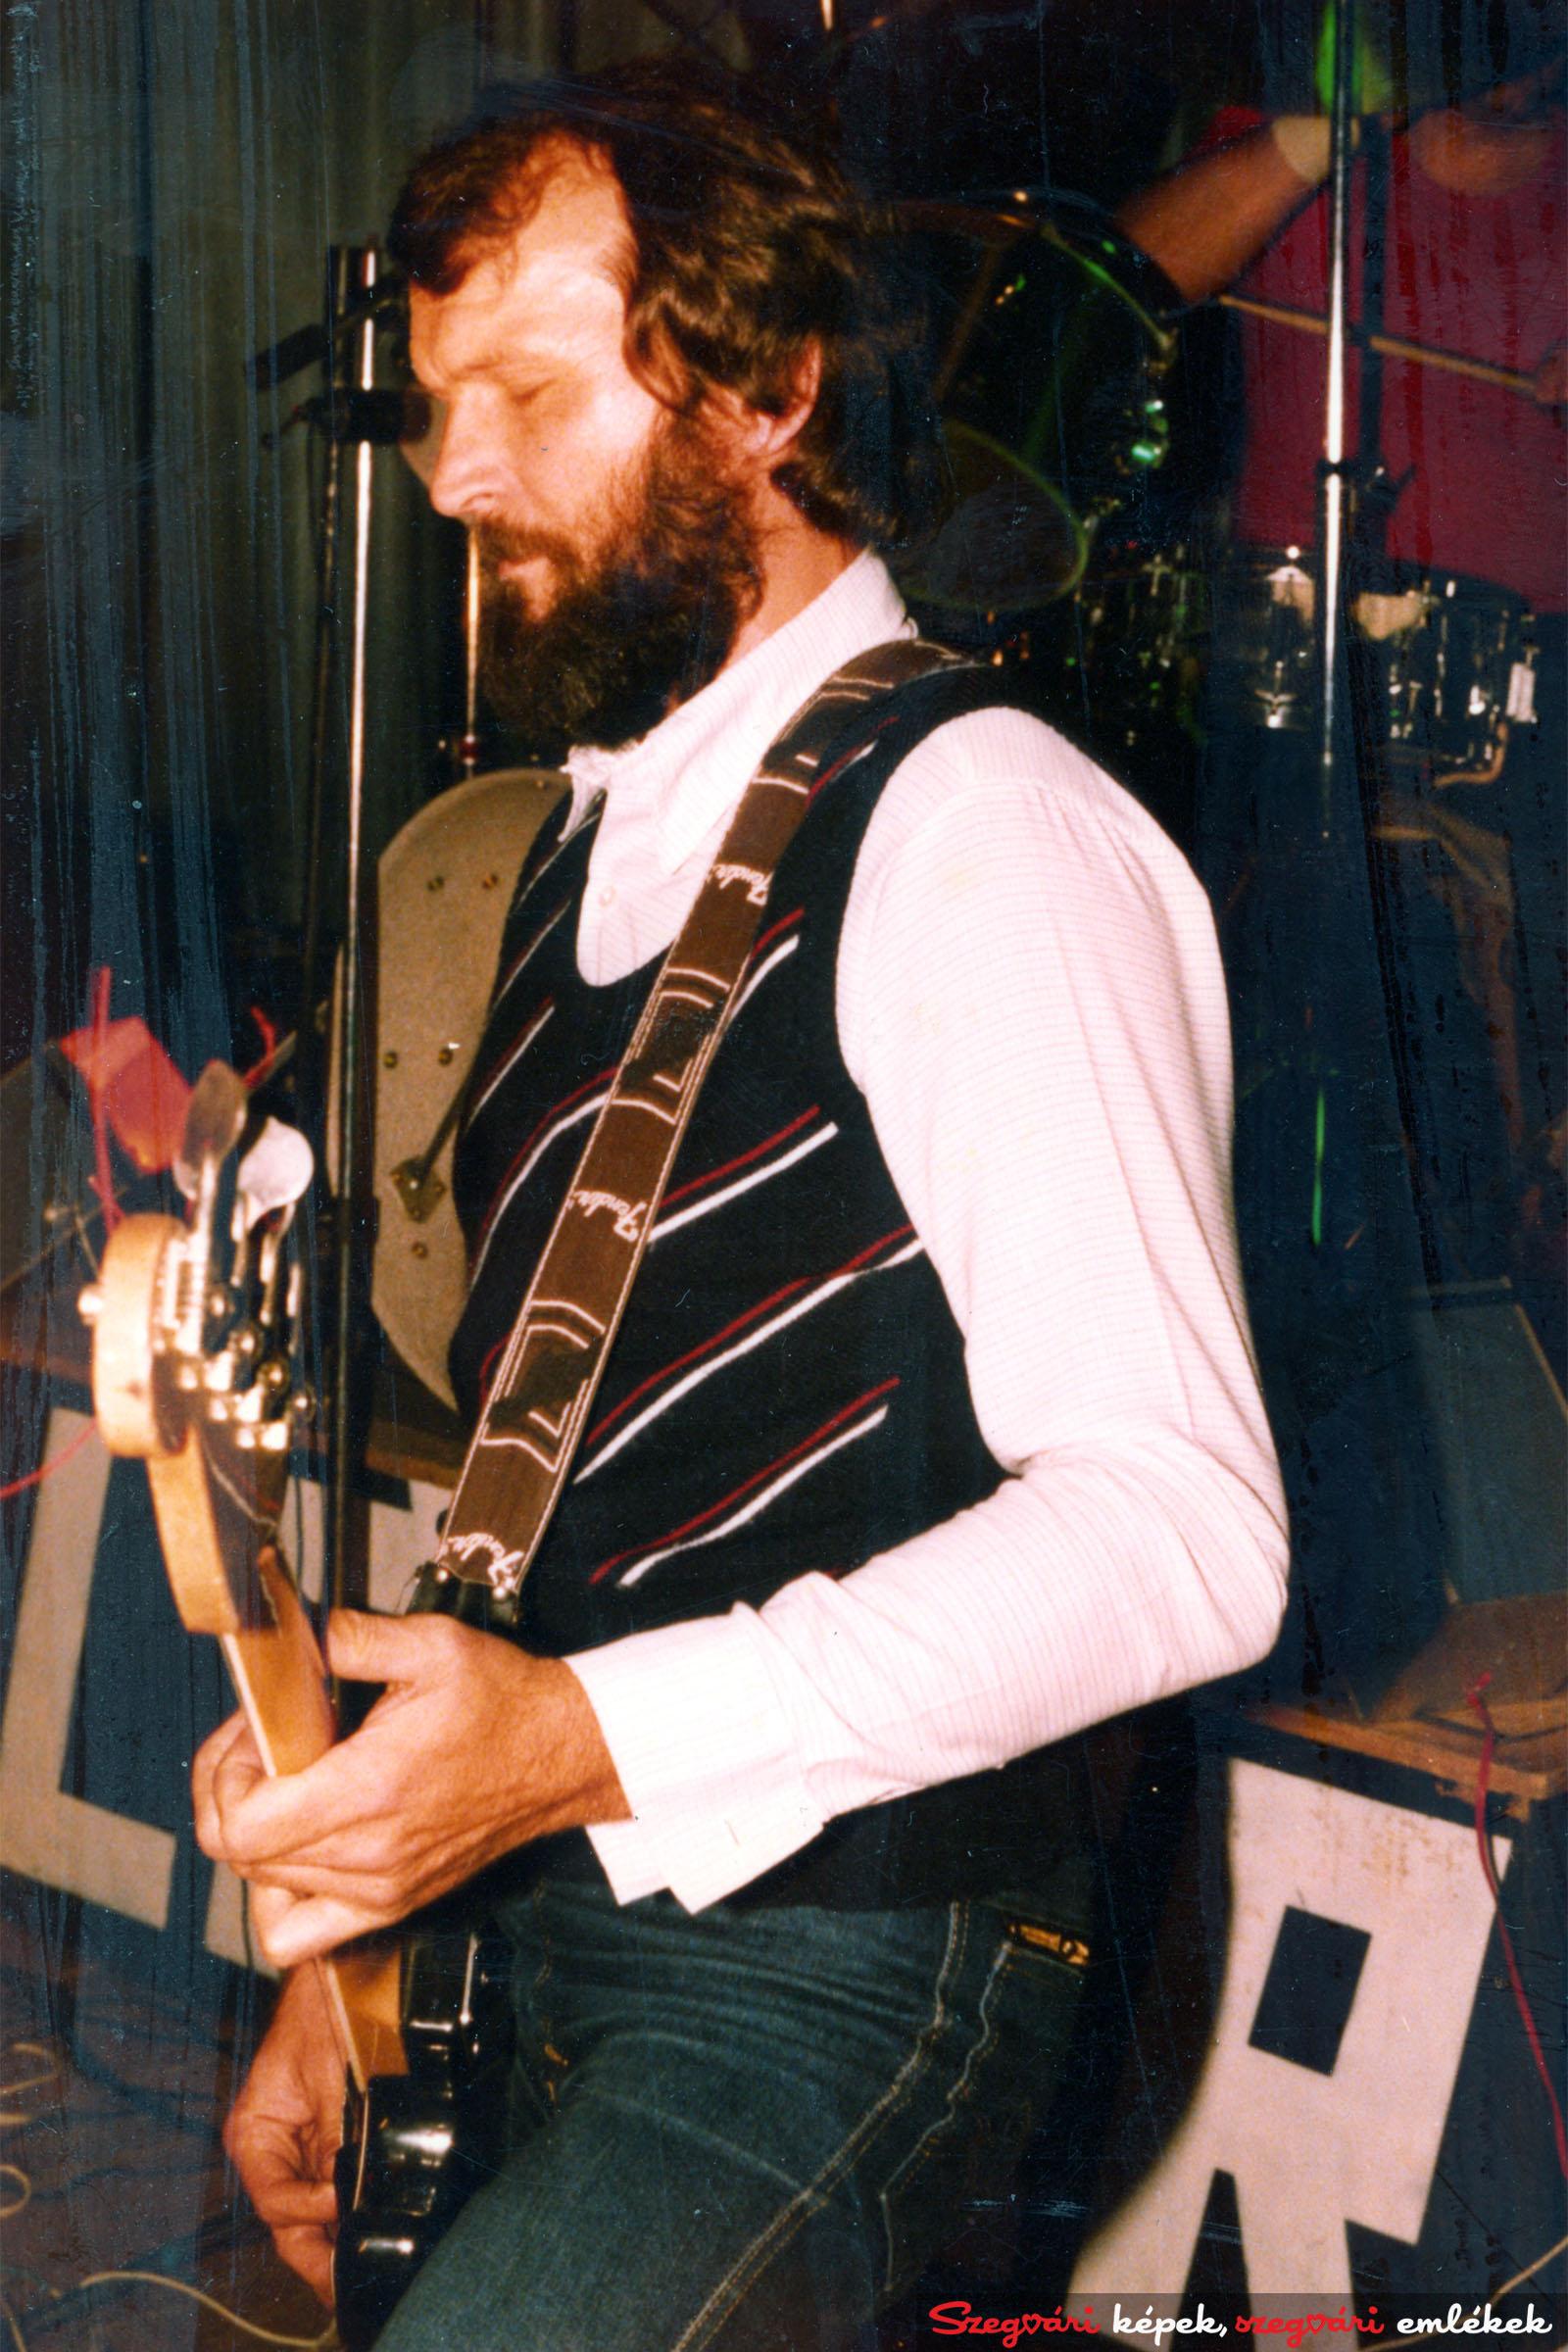 067 Lézer Rock 1980-1983. 010 – Fekete tulipántól a Lézerig,